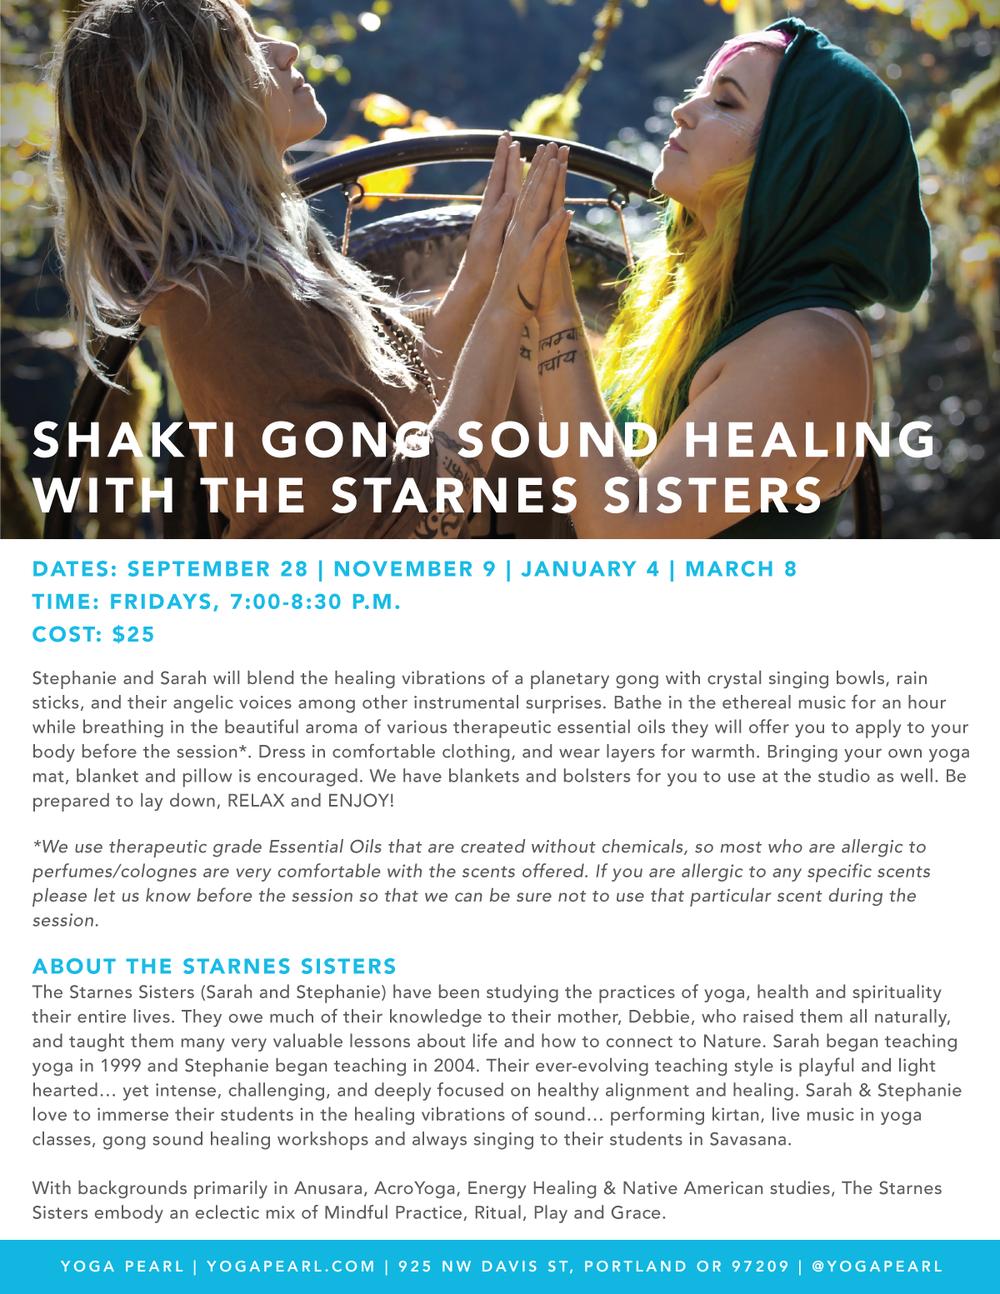 shakti_gong_sound_healing_starnes_sisters.png